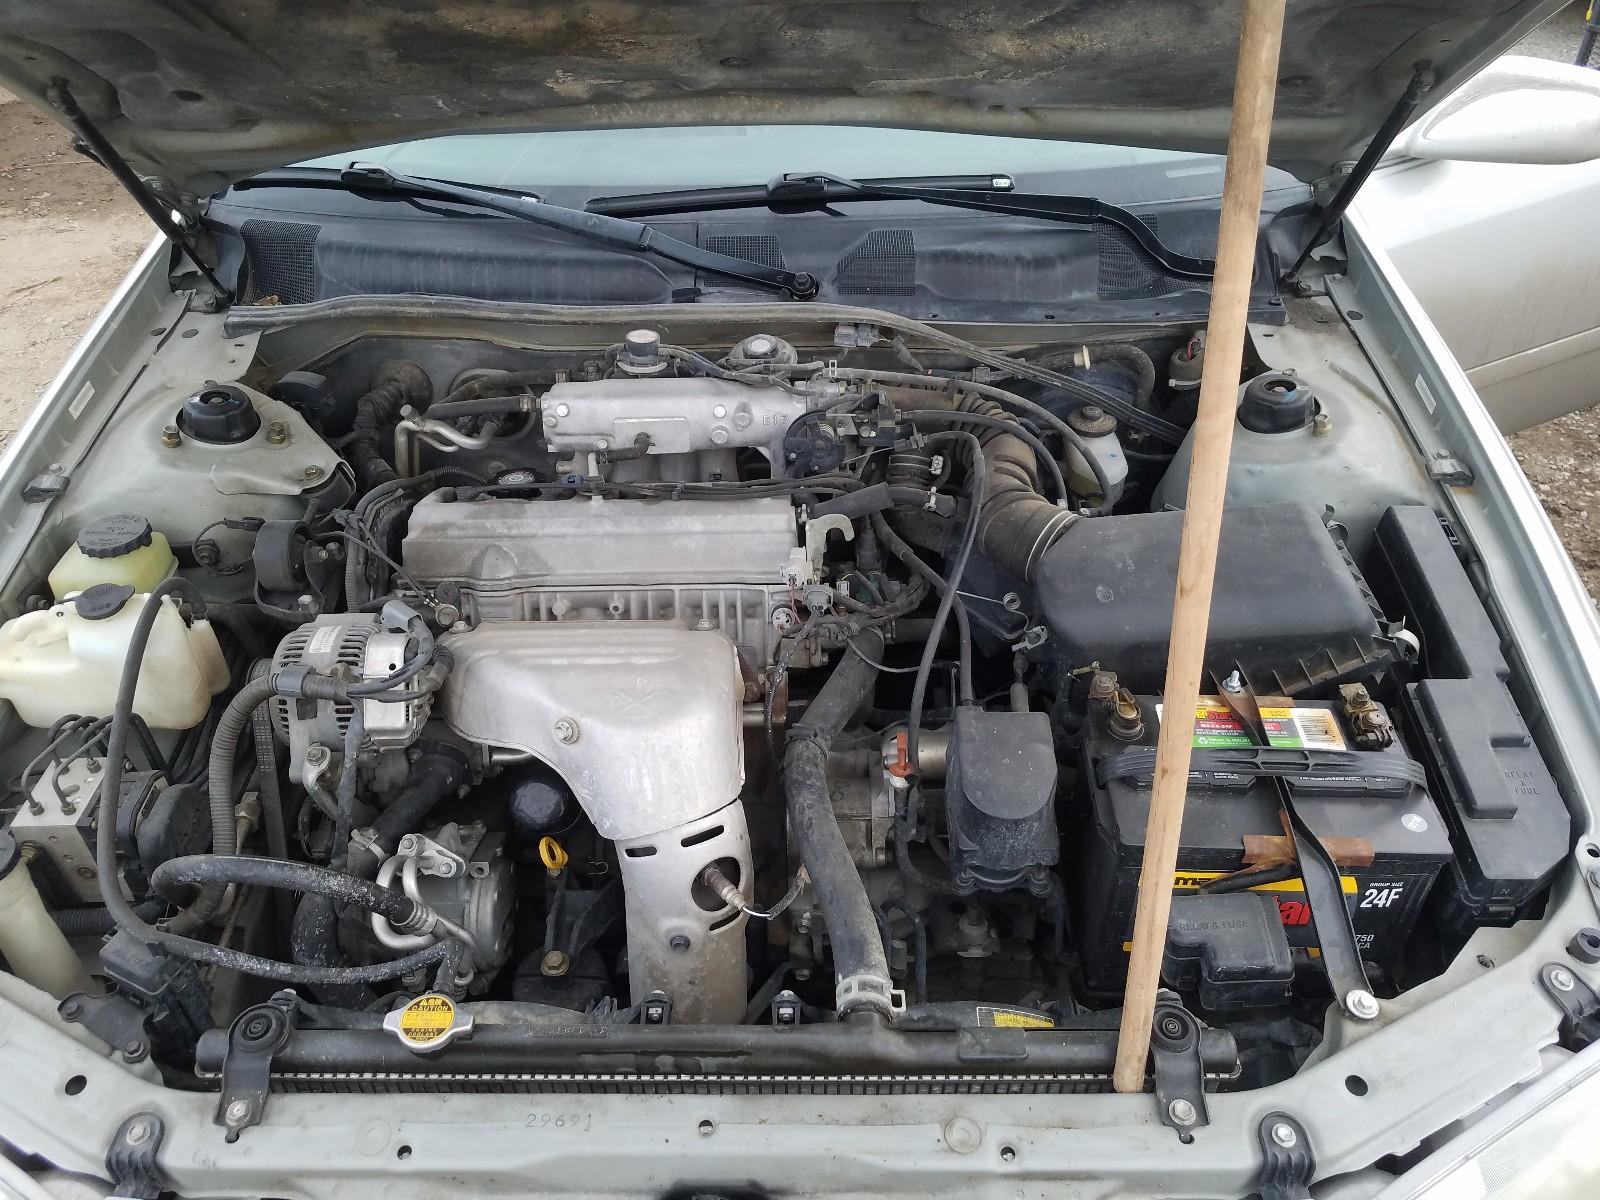 4T1BG22K81U052898 - 2001 Toyota Camry Ce 2.2L inside view